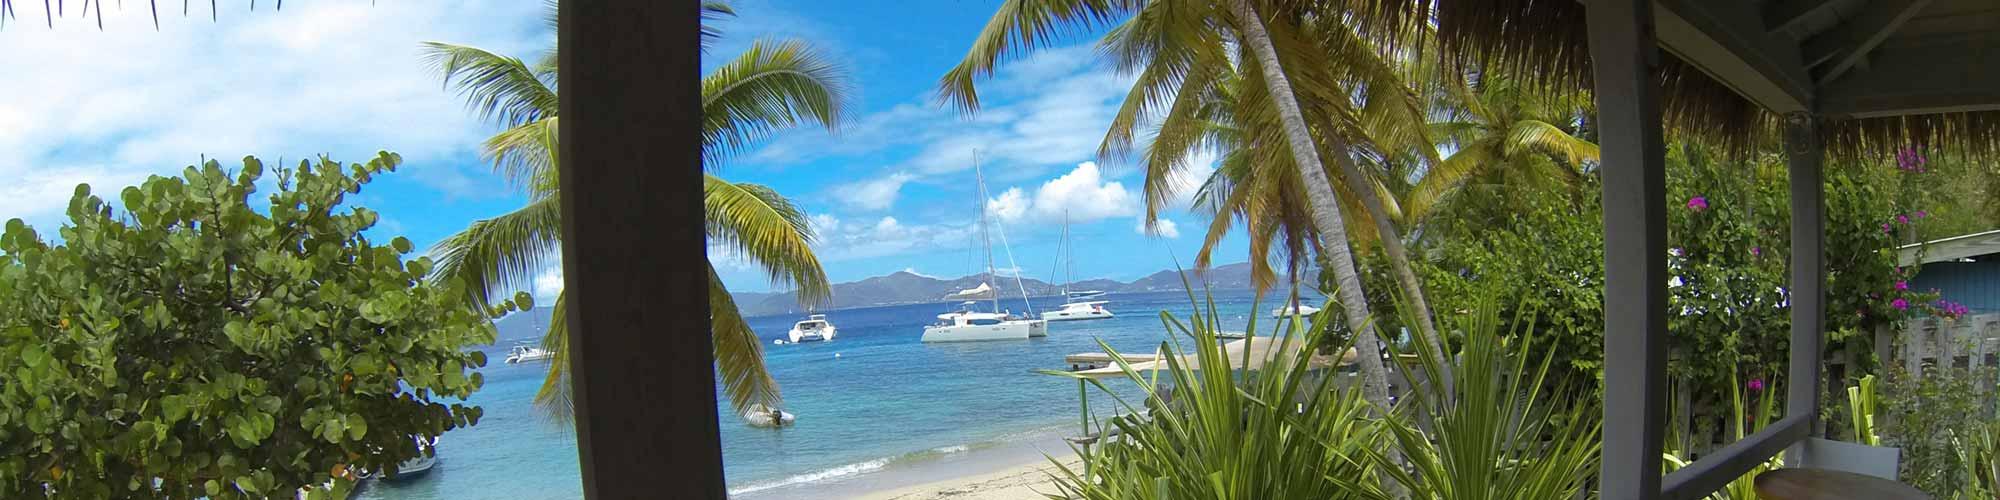 stjohn-cooper-island-day-trip-rockhoppin-charters